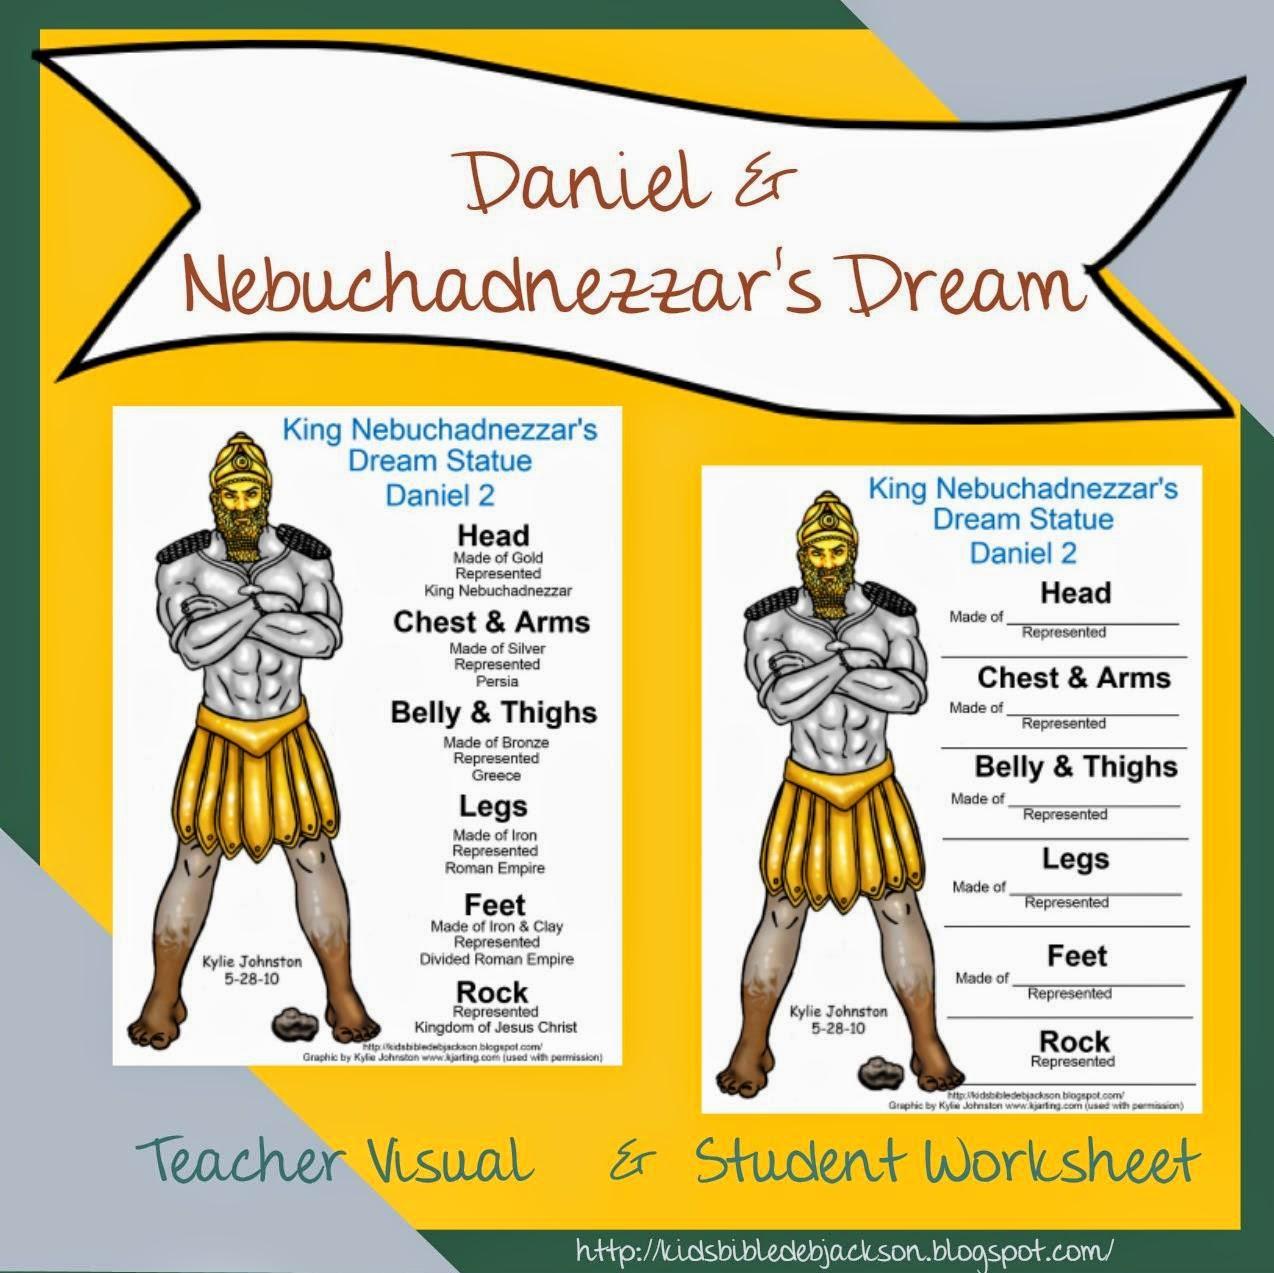 http://kidsbibledebjackson.blogspot.com/2014/05/daniel-nebuchadnezzars-dream.html